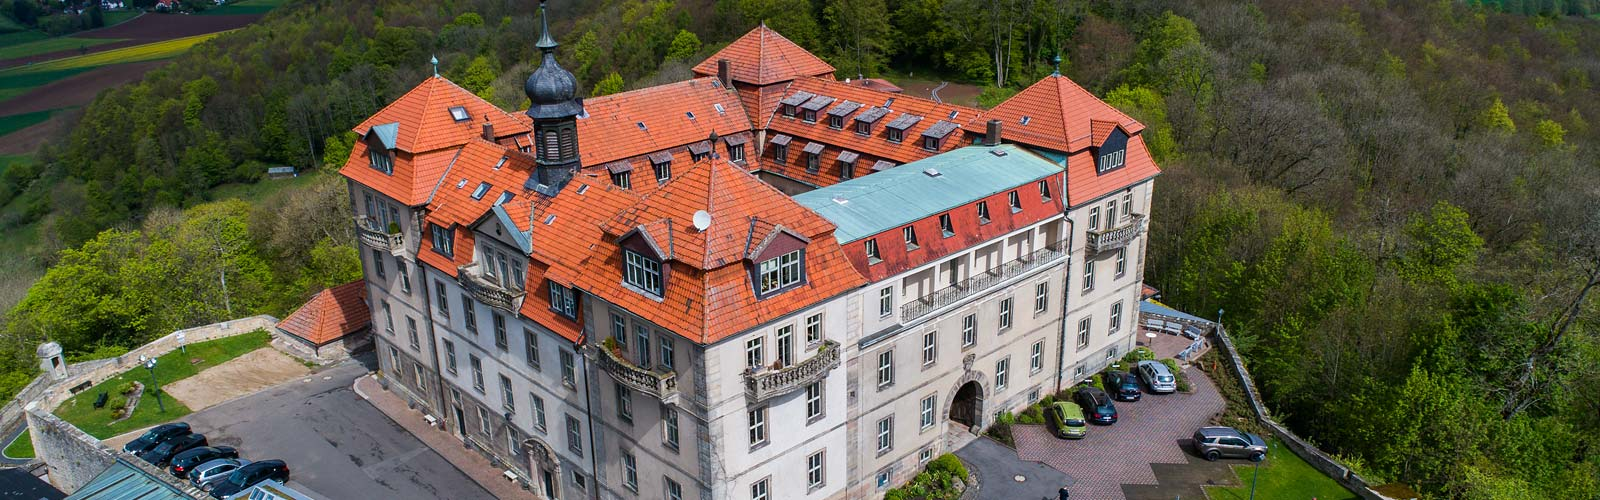 Internat Schloss Bieberstein